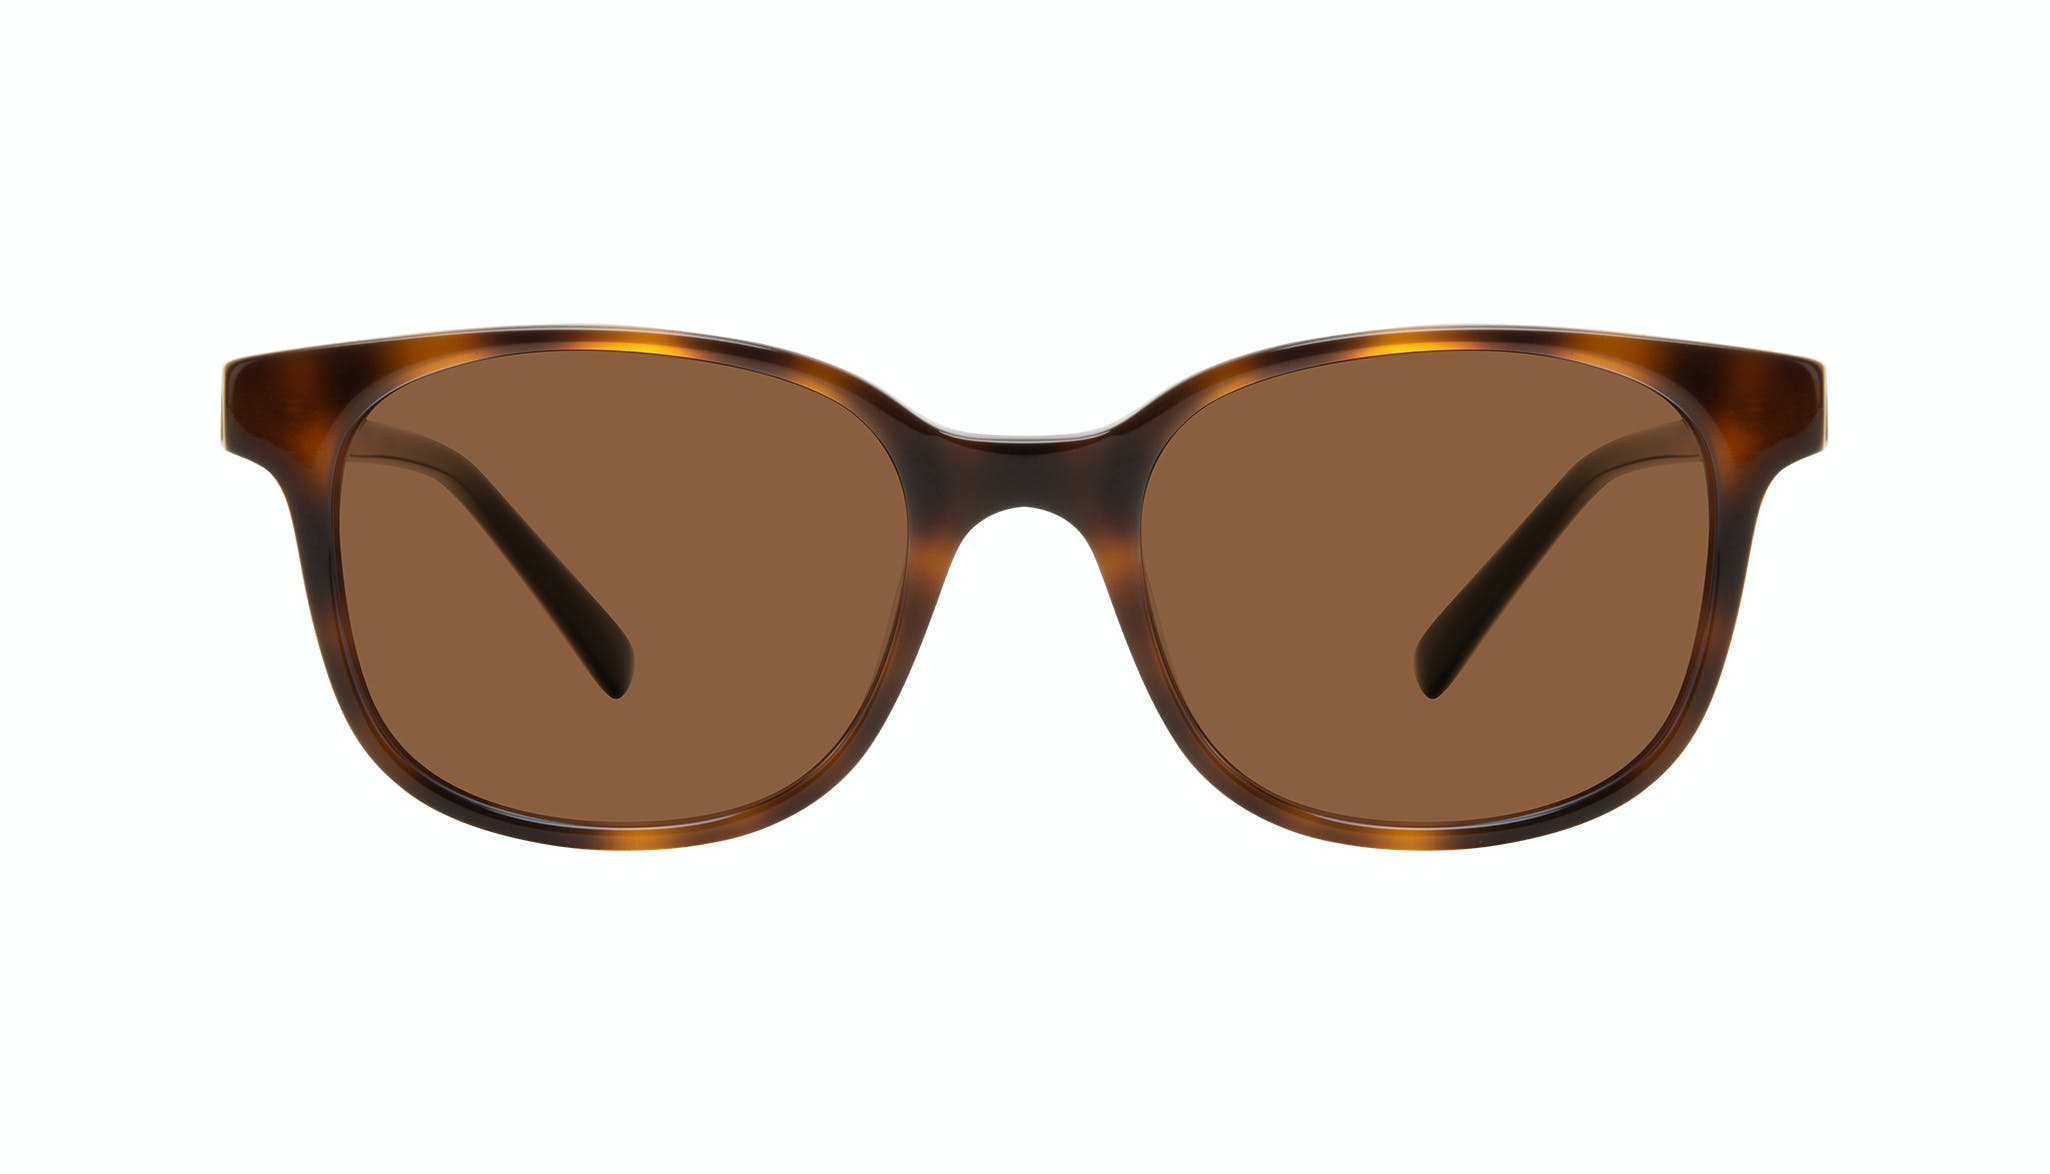 Affordable Fashion Glasses Square Eyeglasses Women Unique Tortoise